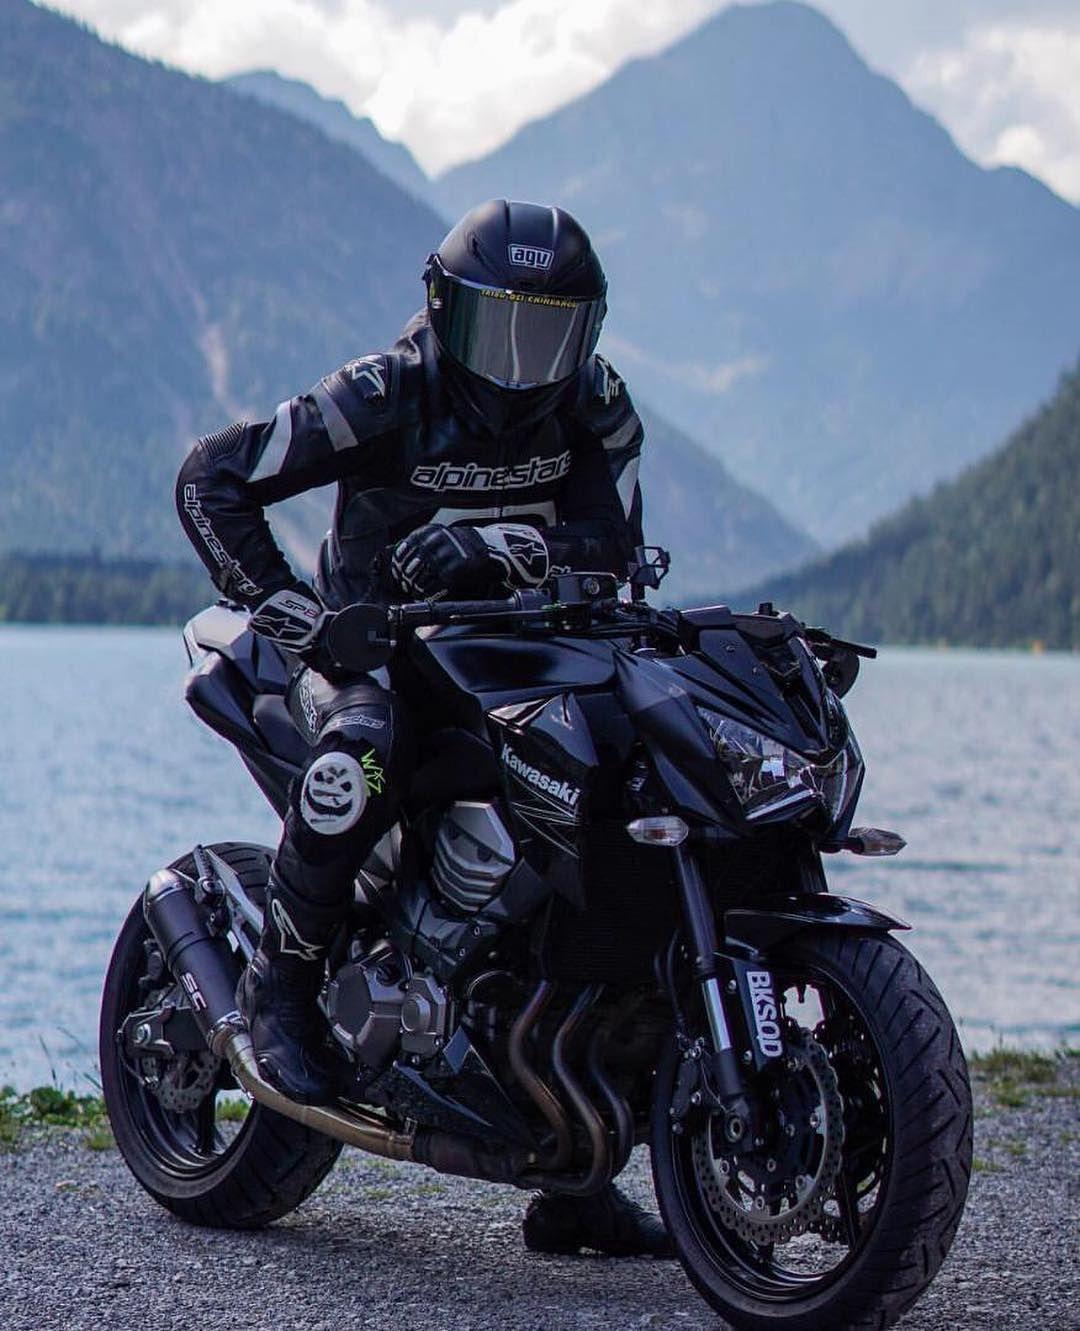 Обои Kawasaki, Мотоцикл, z800. Мотоциклы foto 11